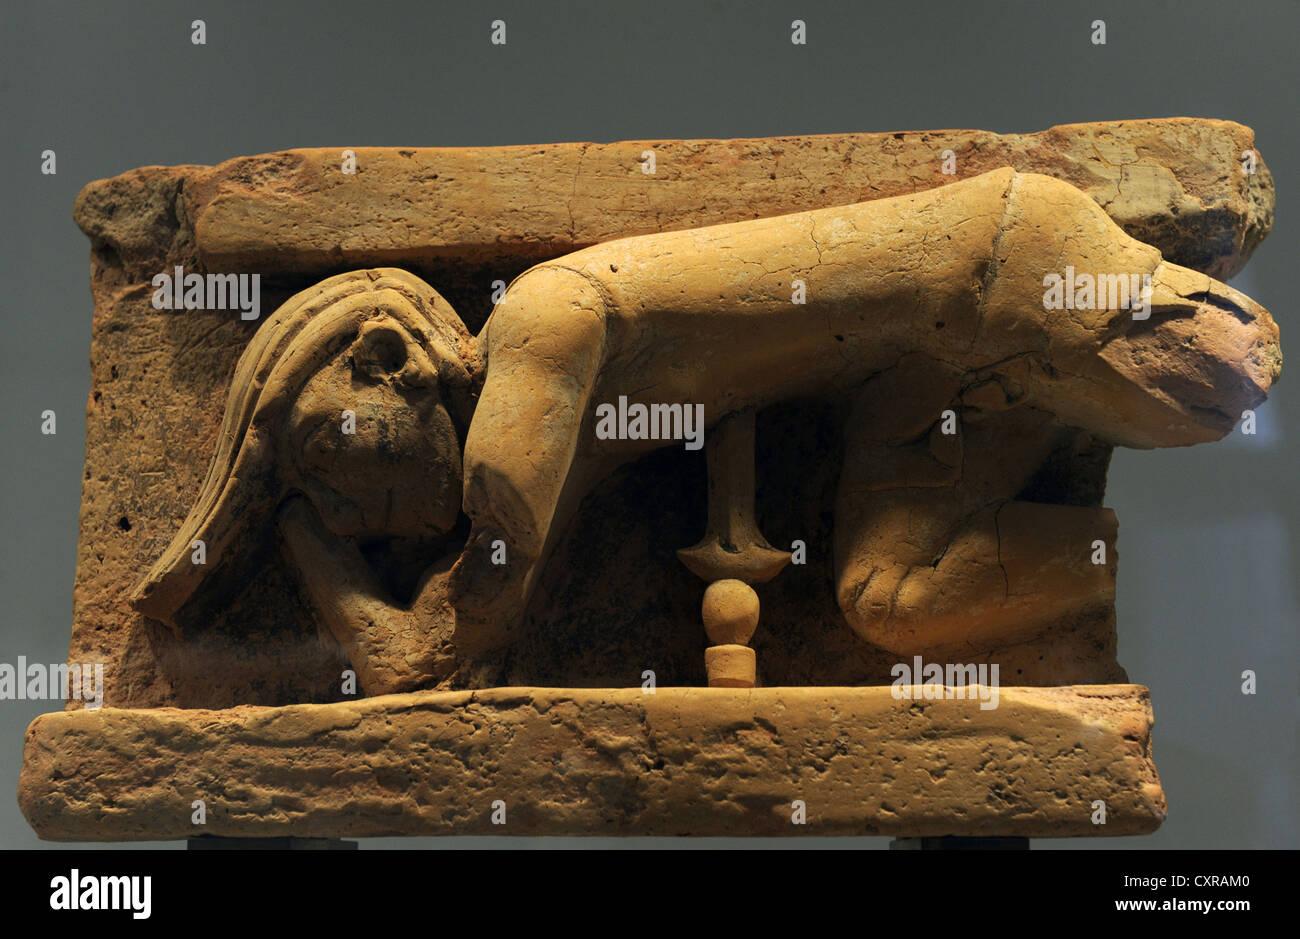 Greek Art. Altar with greek myths. The suicide of Ajax by throwing himself on his sword. Ny Carlsberg Glyptotek. - Stock Image